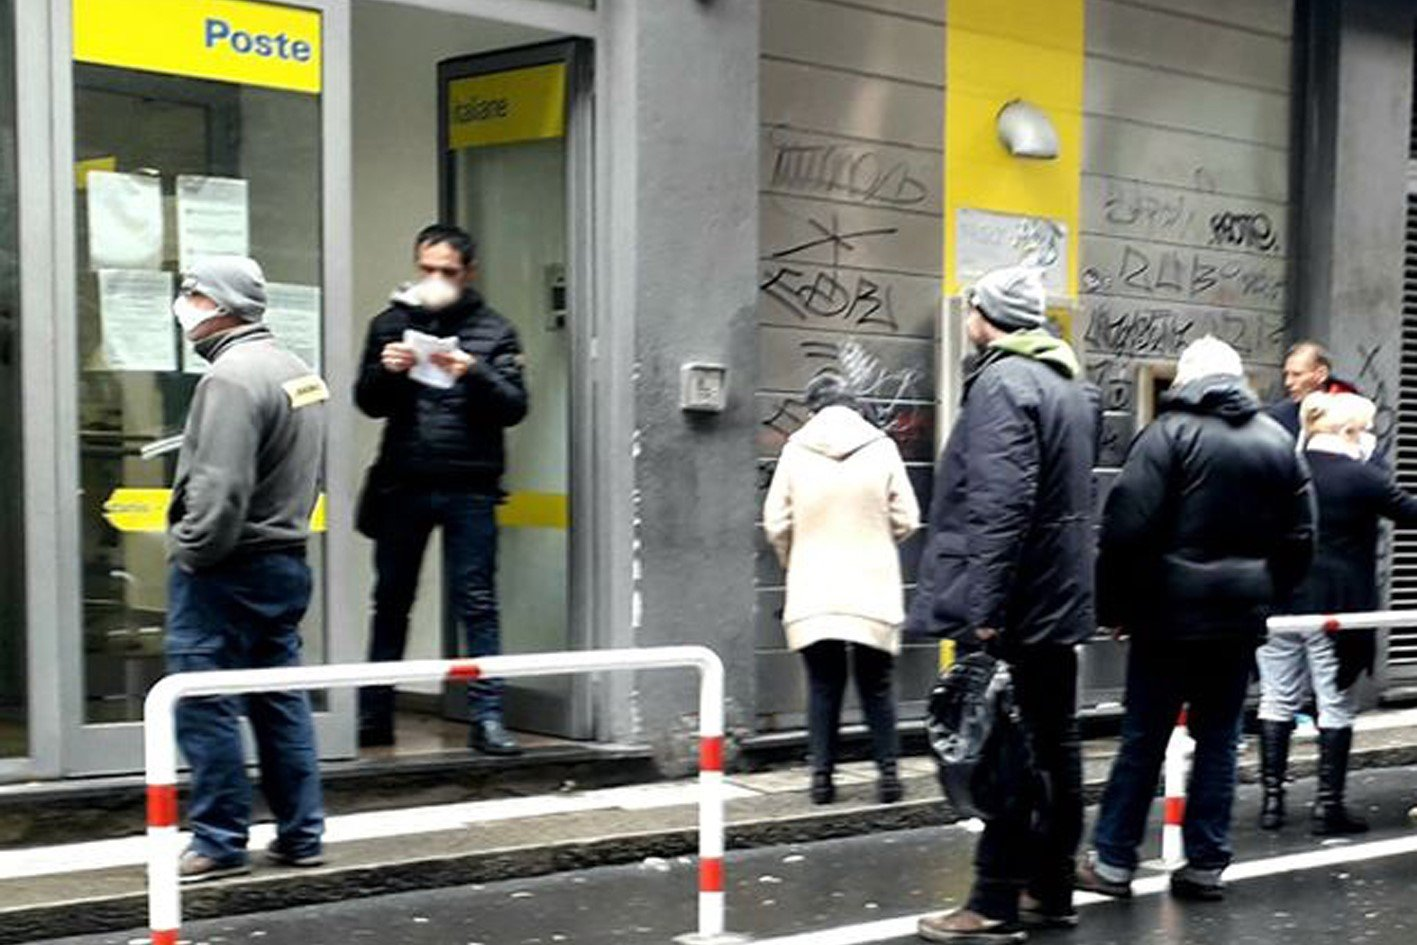 Masini: Poste Italiane, scelte discutibili